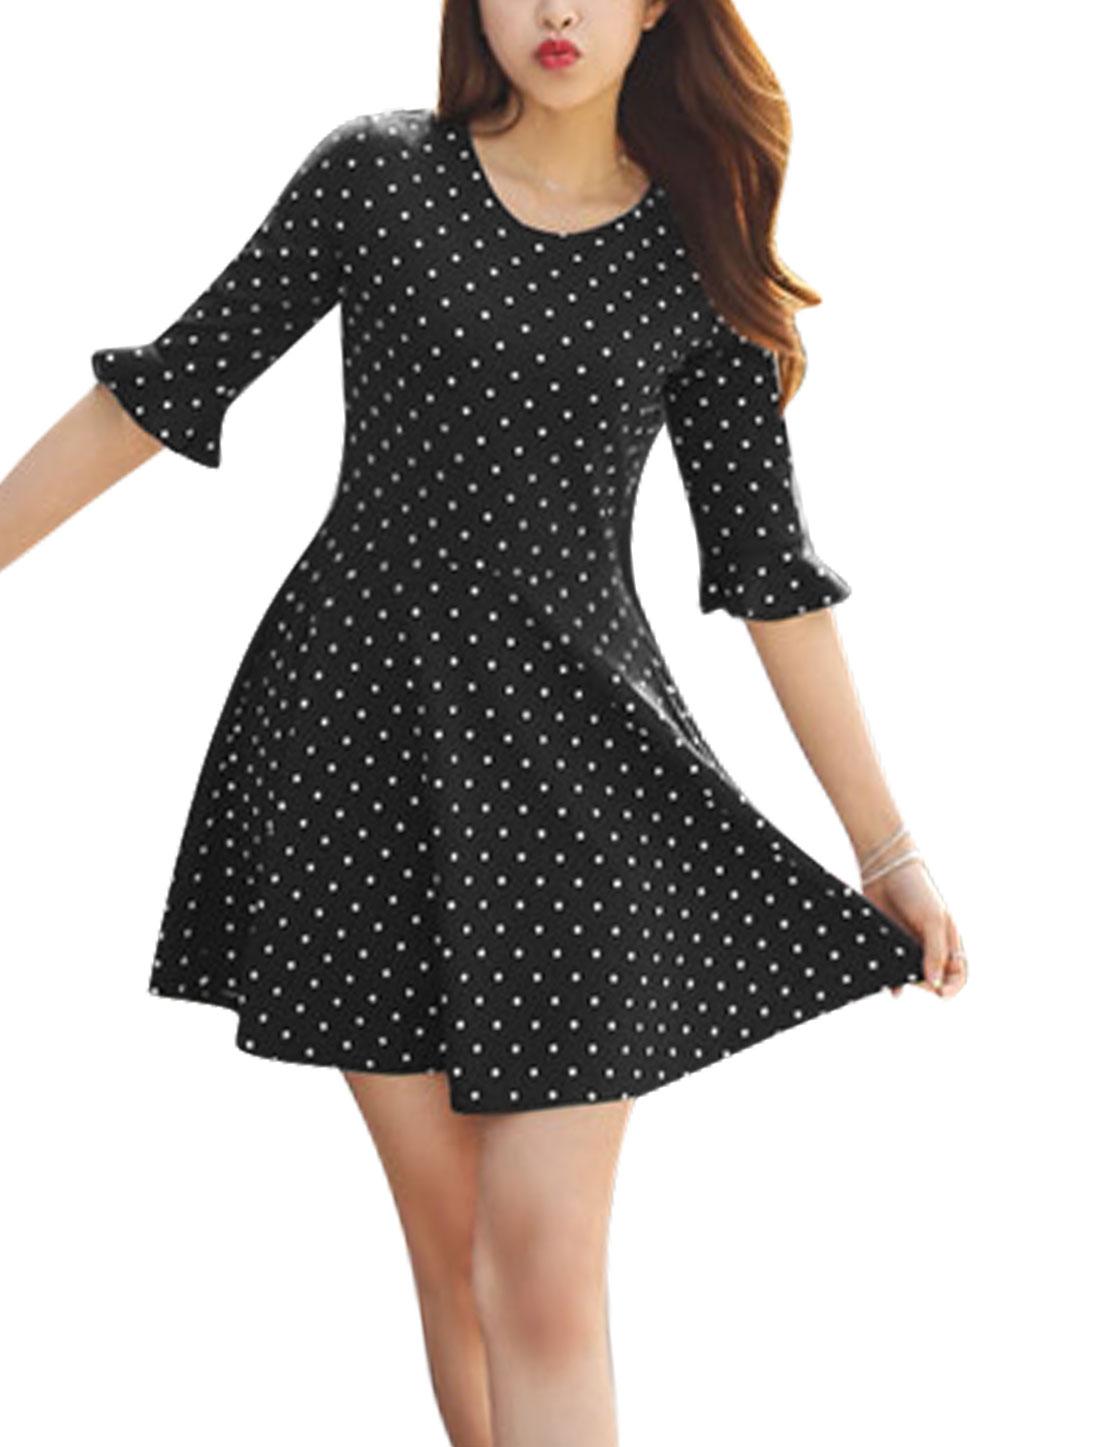 Ladies Round Neck Polka Dots Print Unlined Skater Dress Black S